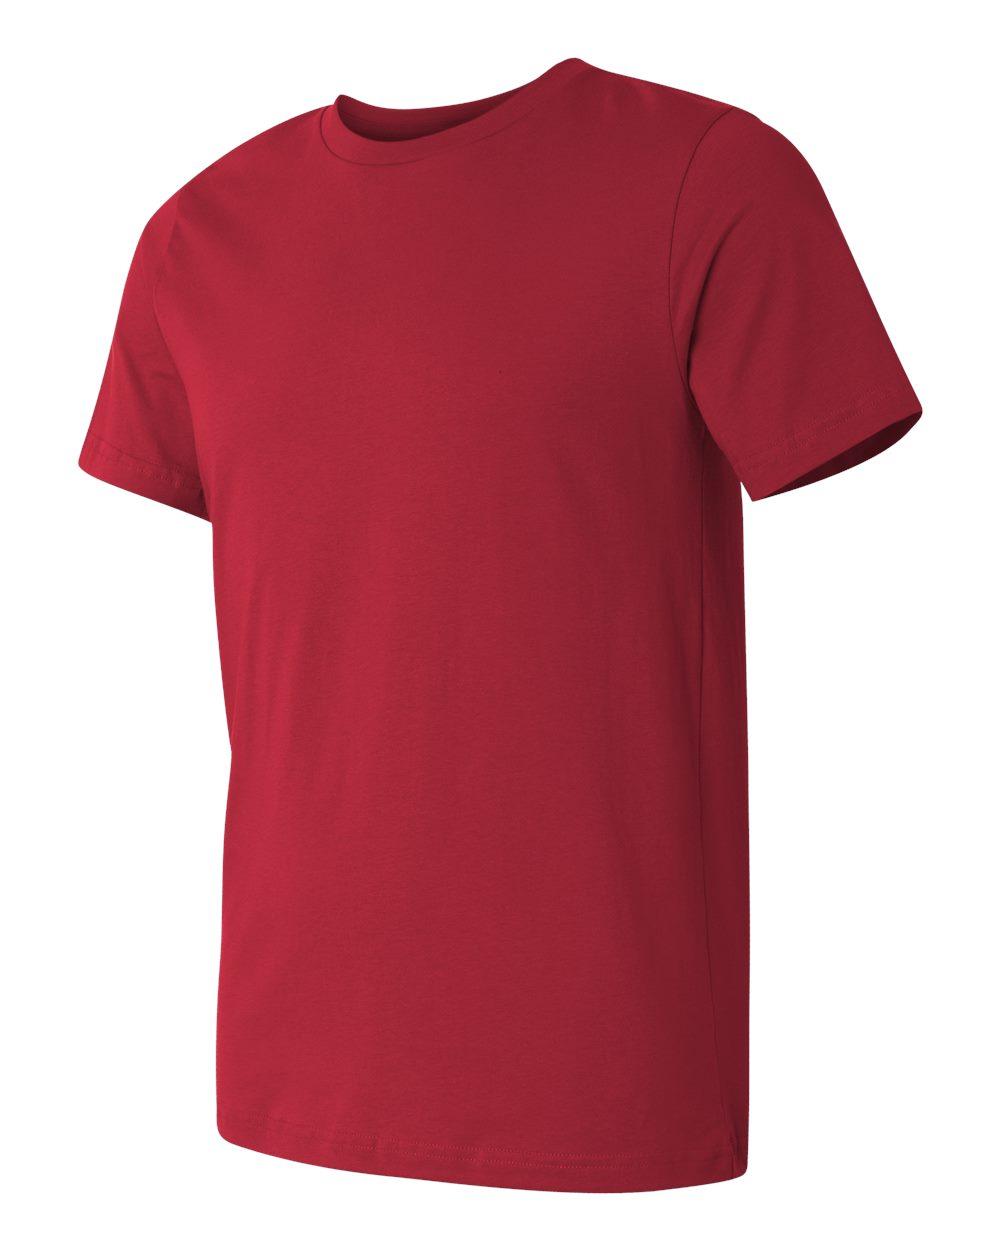 Bella-Canvas-Unisex-Made-in-USA-Jersey-Short-Sleeve-T-Shirt-3001U-XS-3XL thumbnail 36